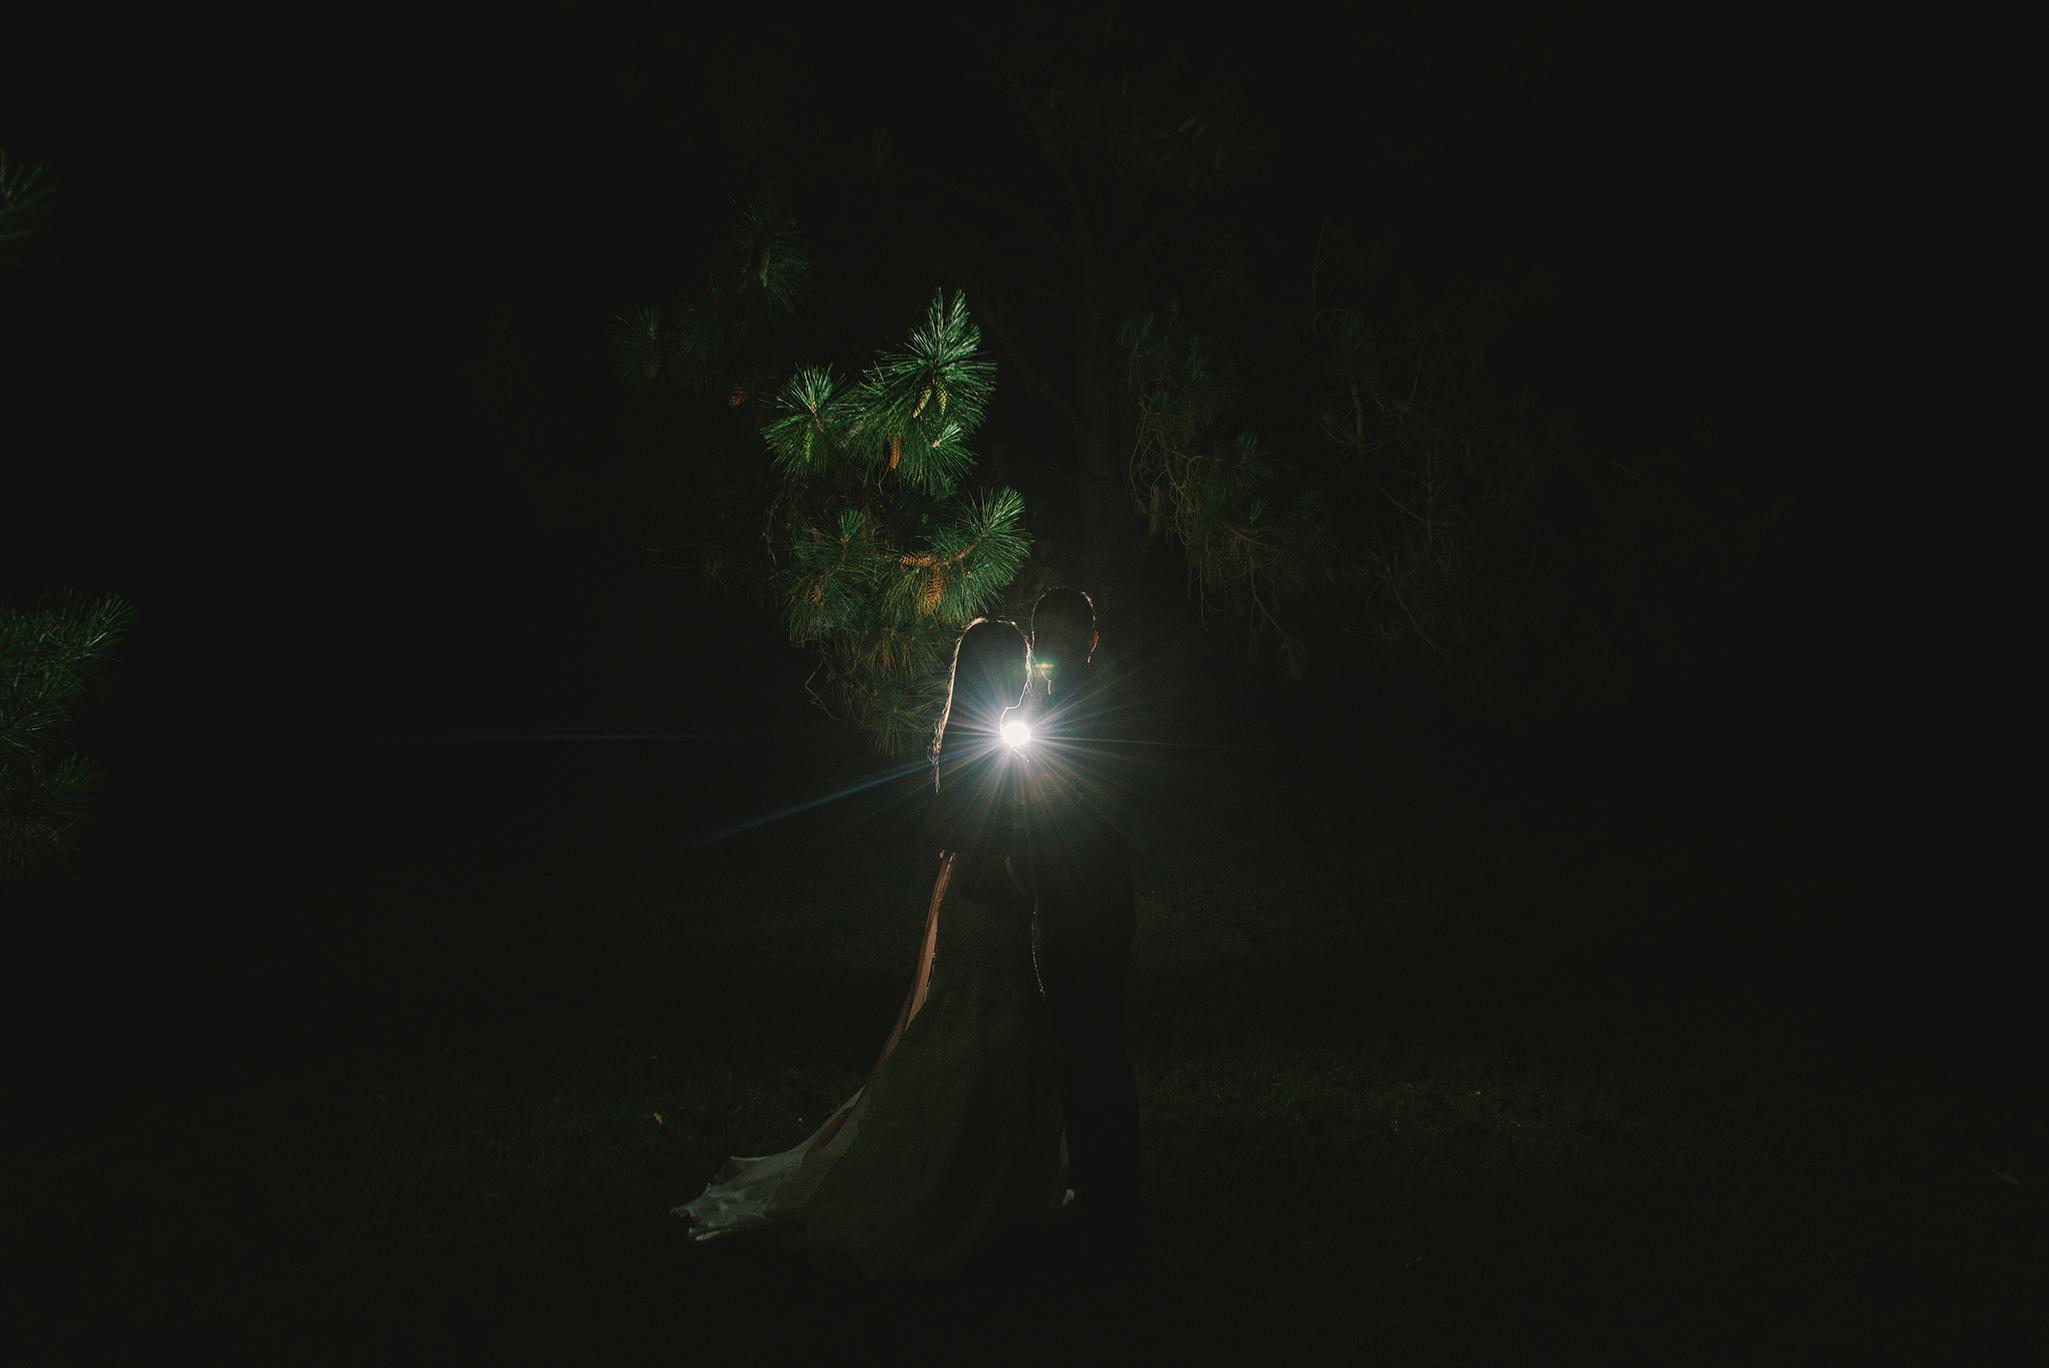 Mer-&-Mati-182